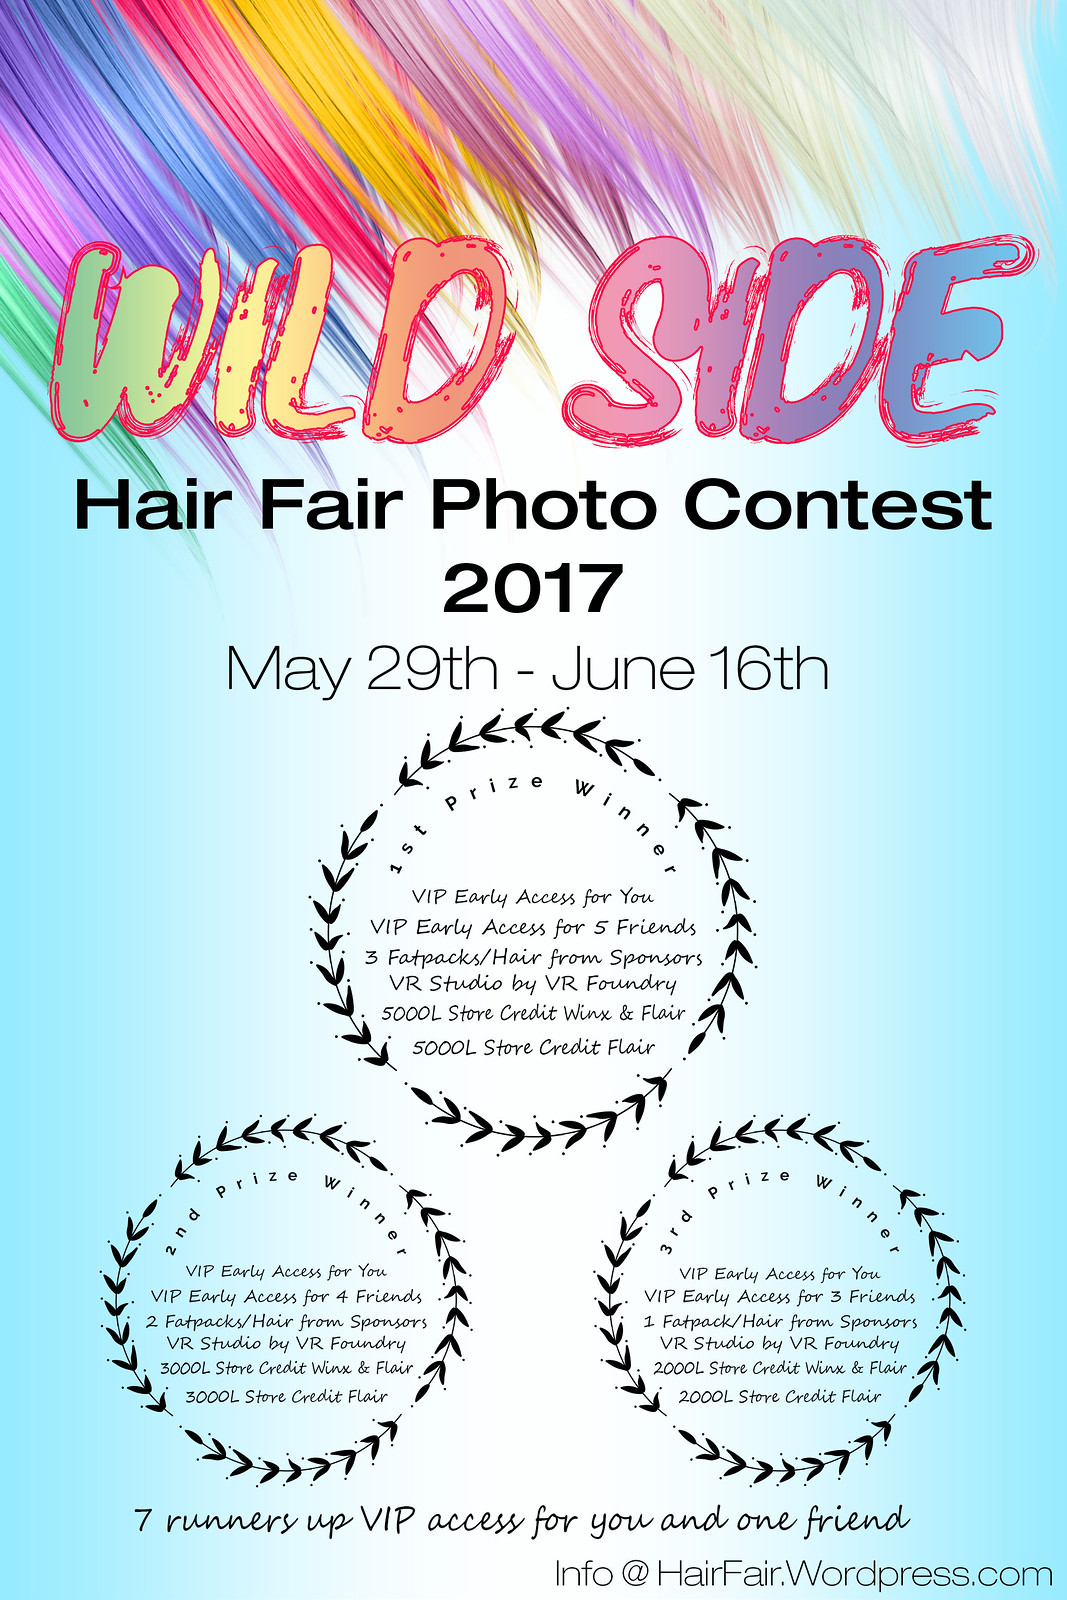 Hair Fair 2017 Photo Contest -  Wild Side